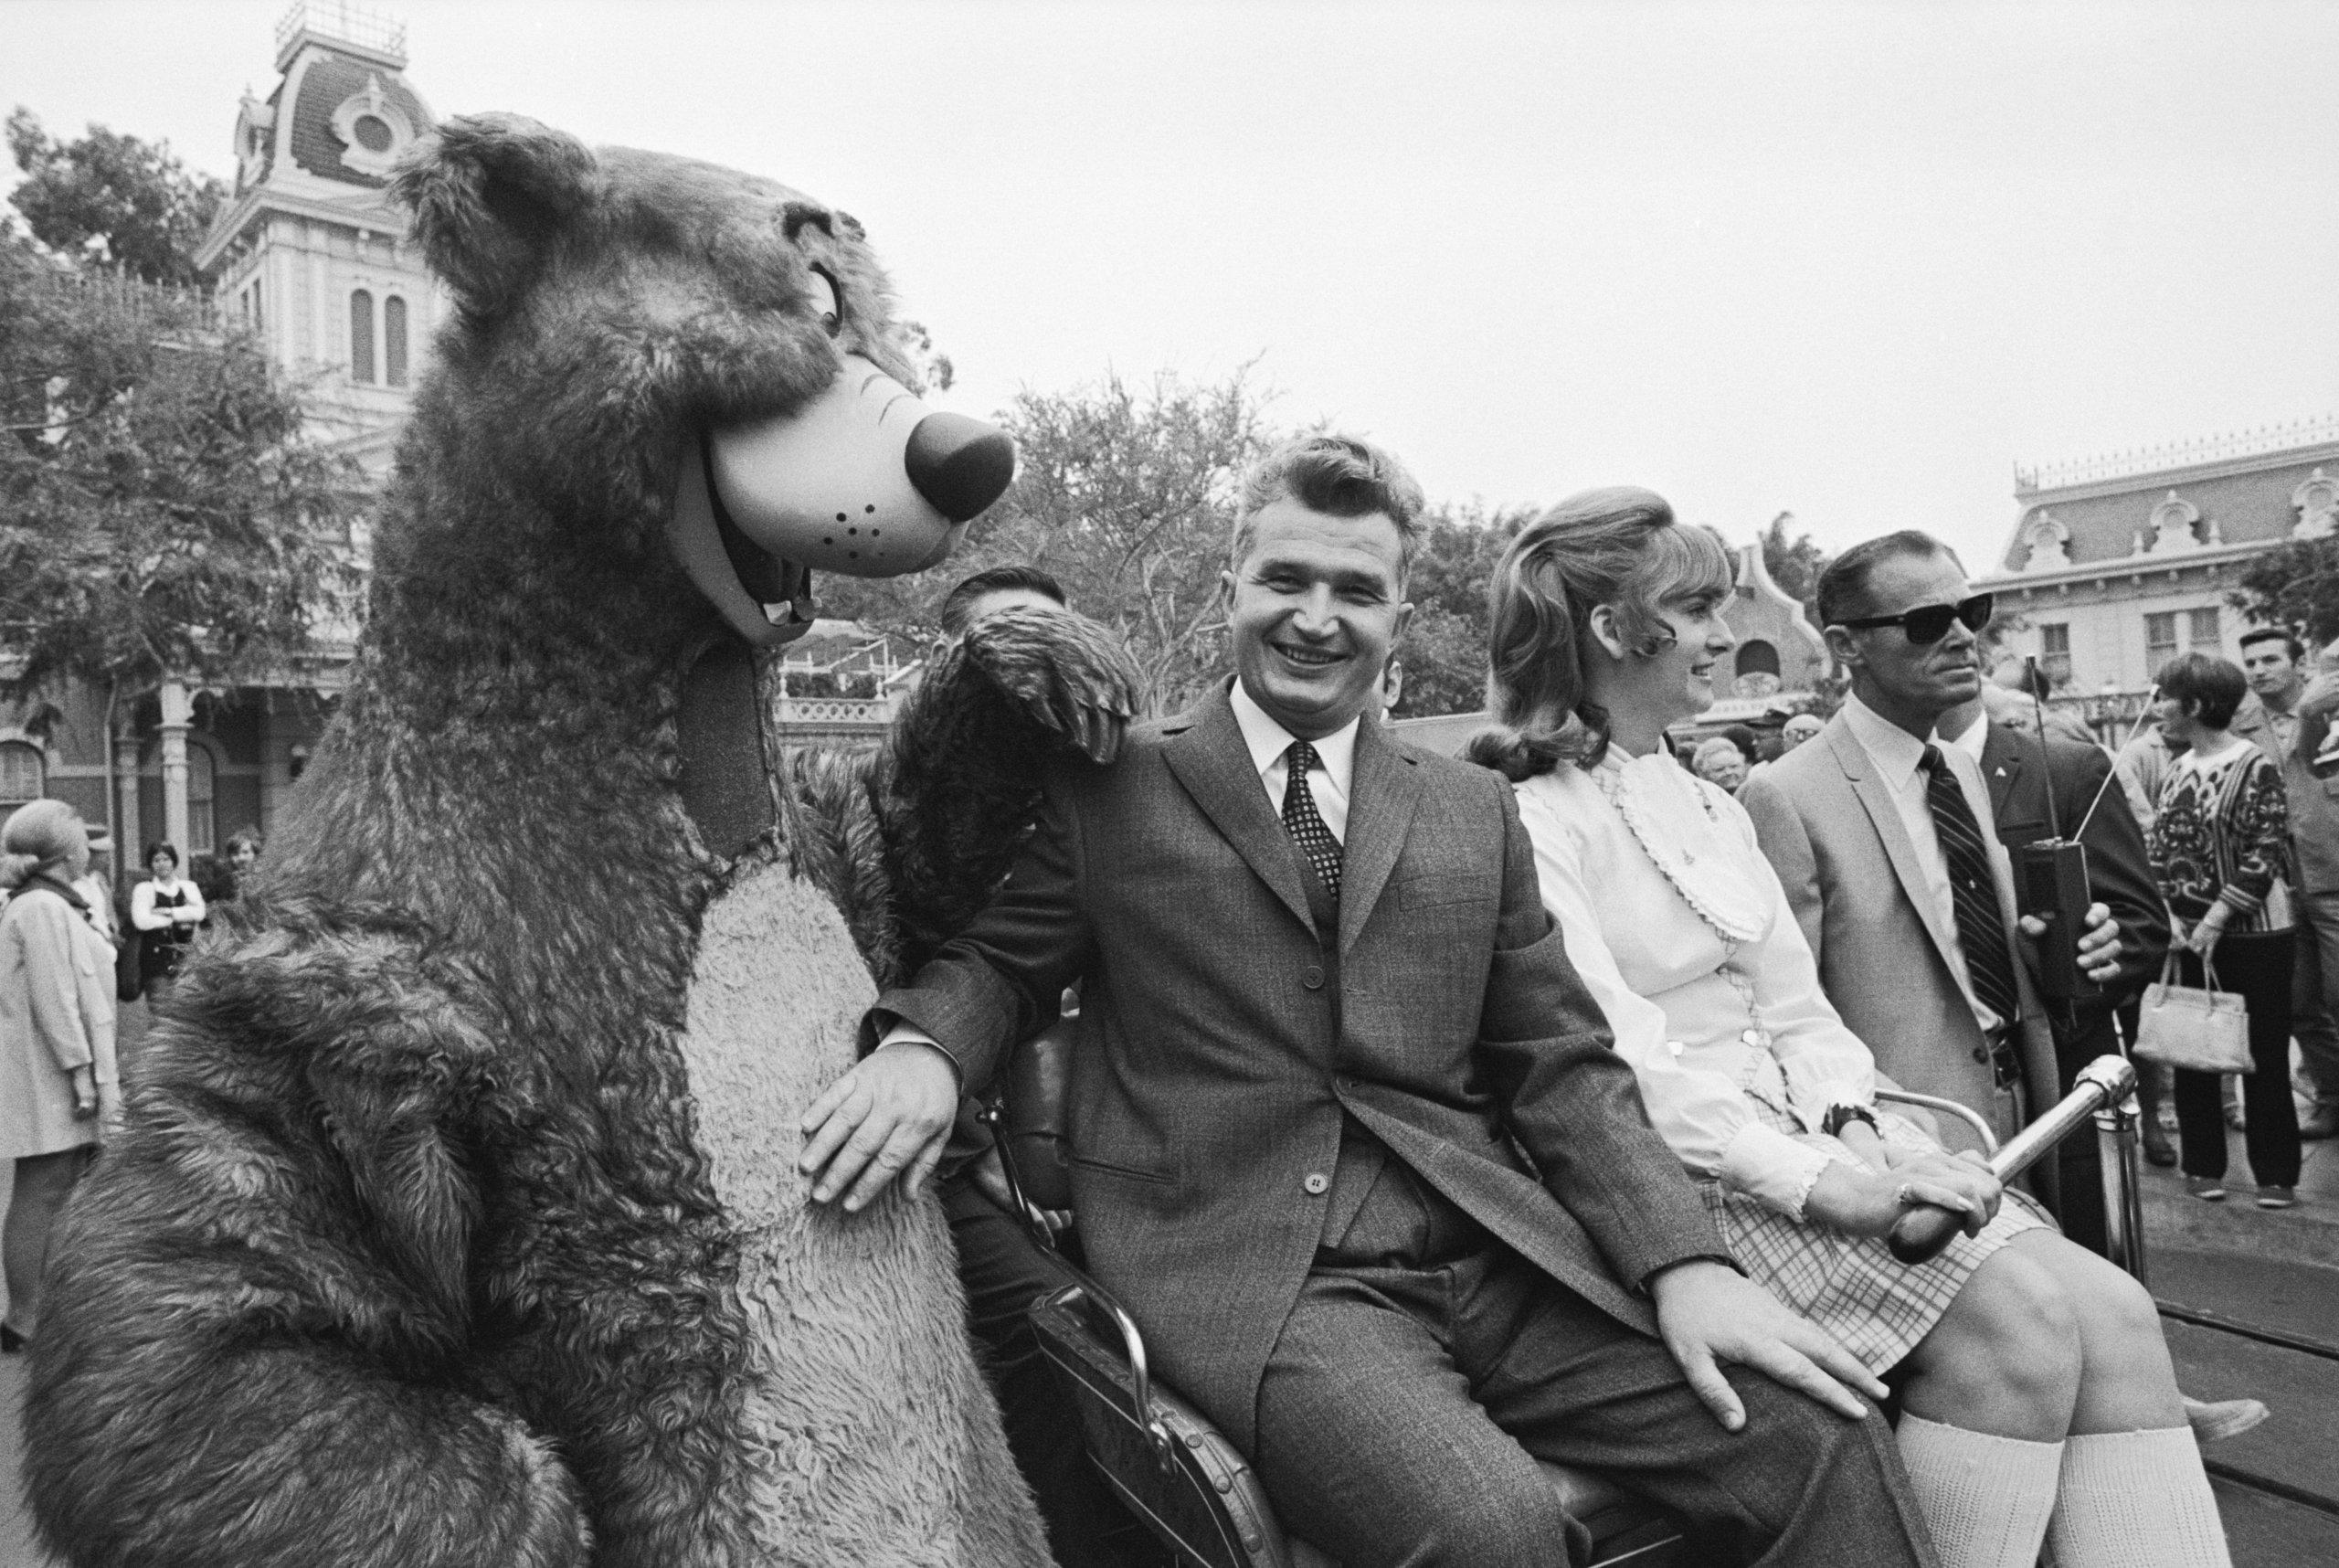 Romanian Leader Visits Disneyland